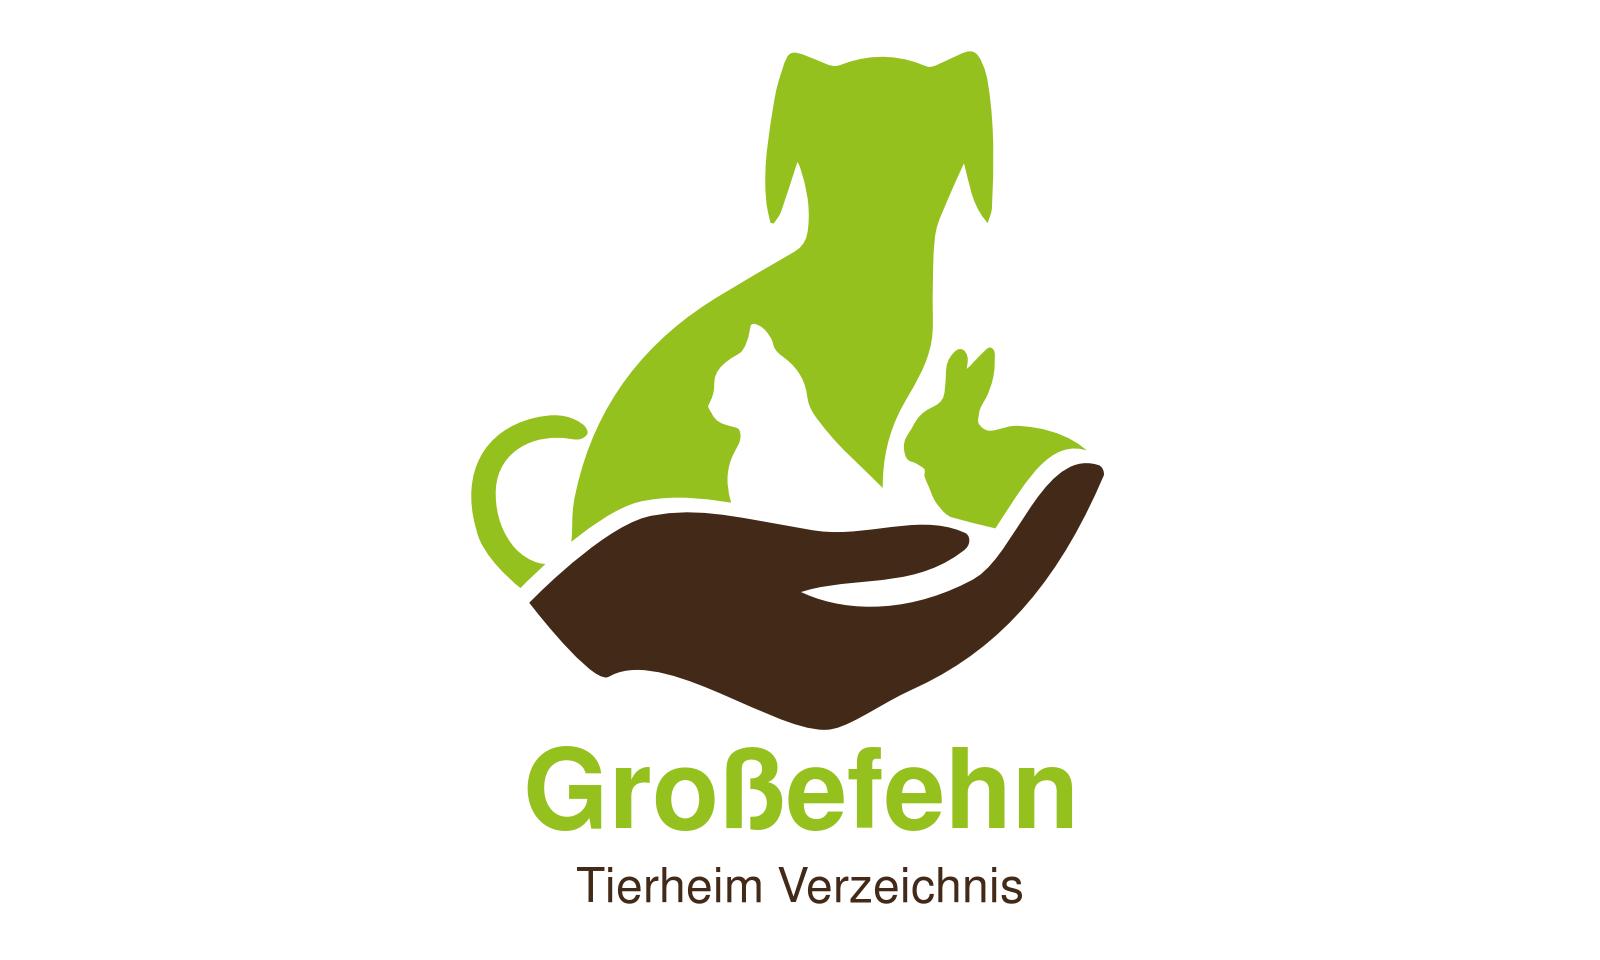 Tierheim Großefehn